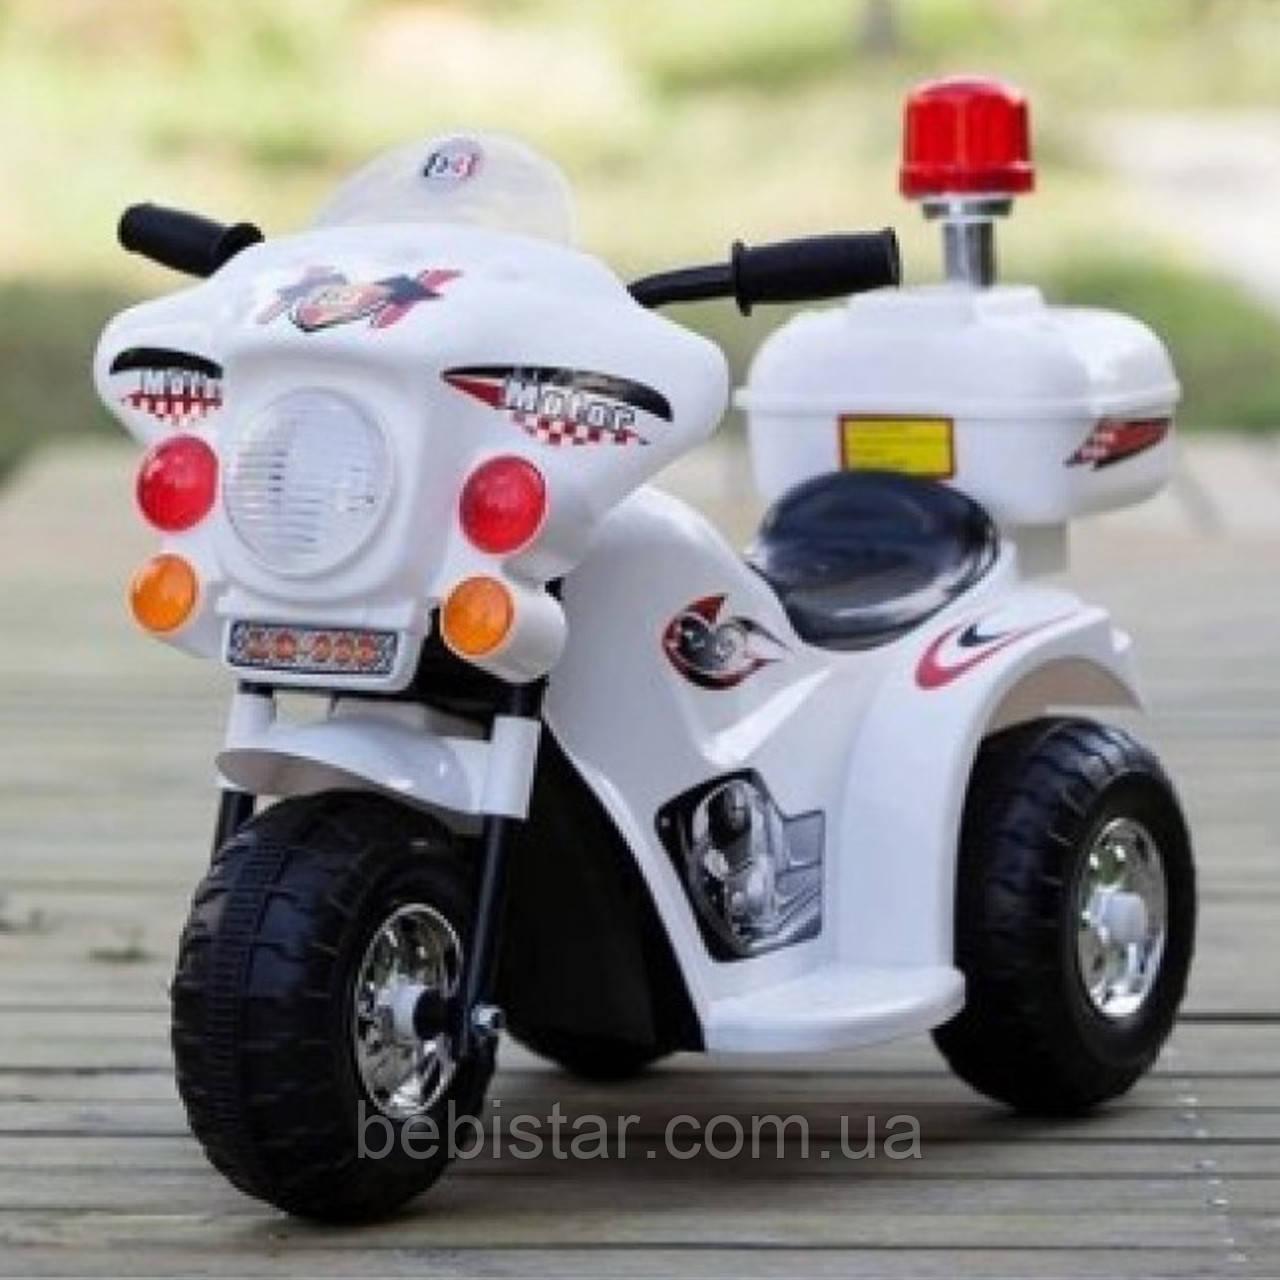 Детский электромобиль-мотоцикл Т-723 белый деткам 3-5 лет